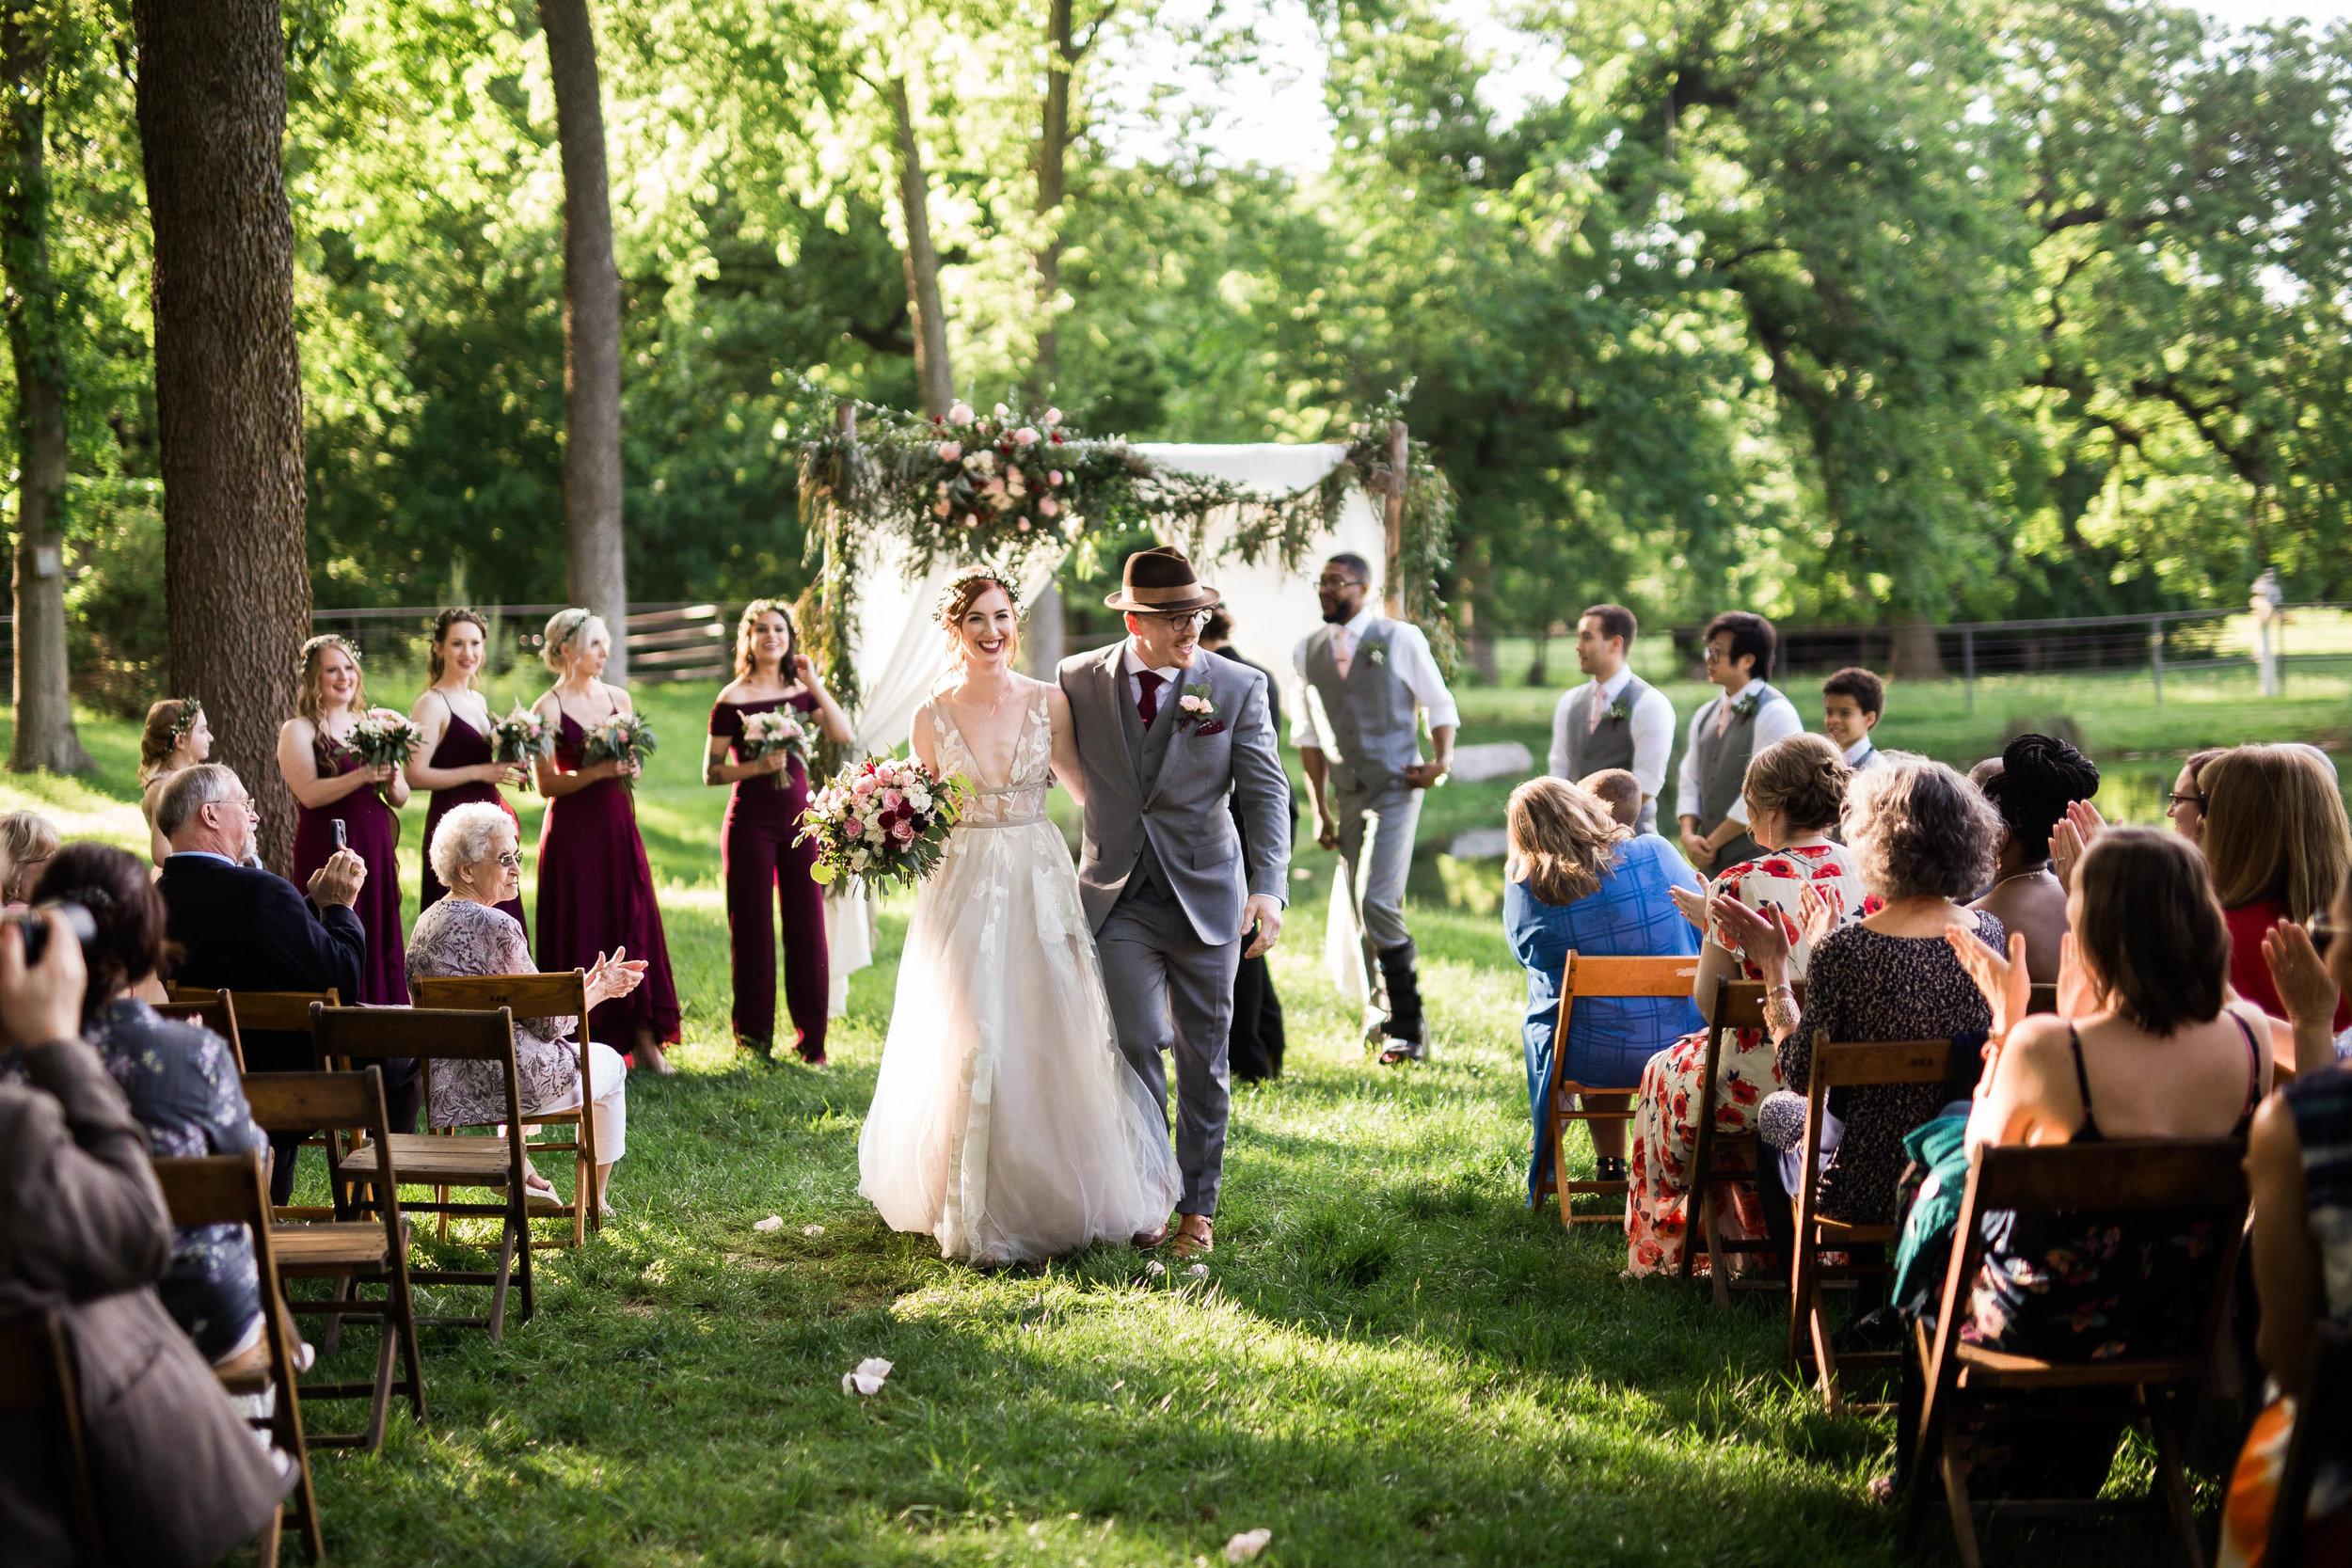 armstrong-wedding-519.jpg